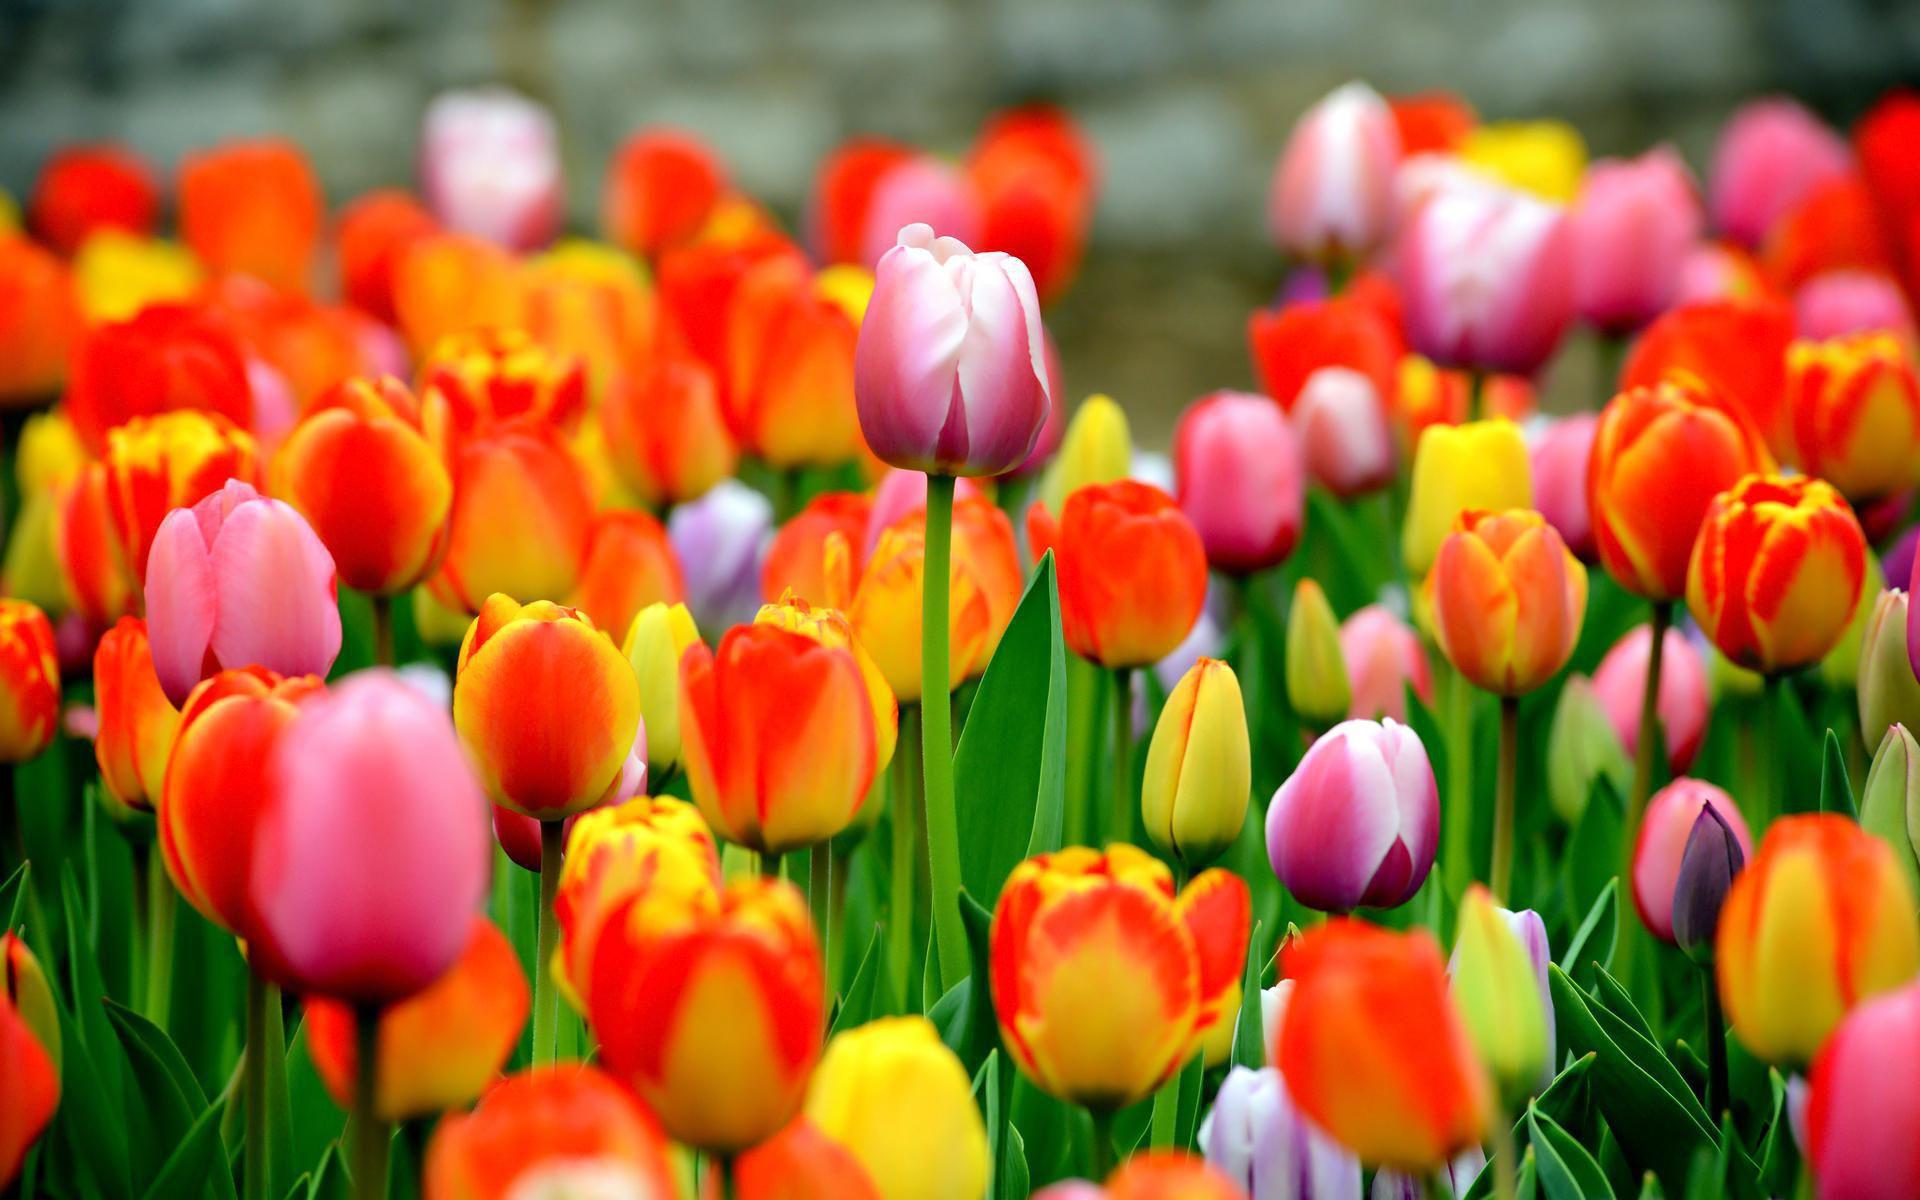 Tulips Computer Backgrounds